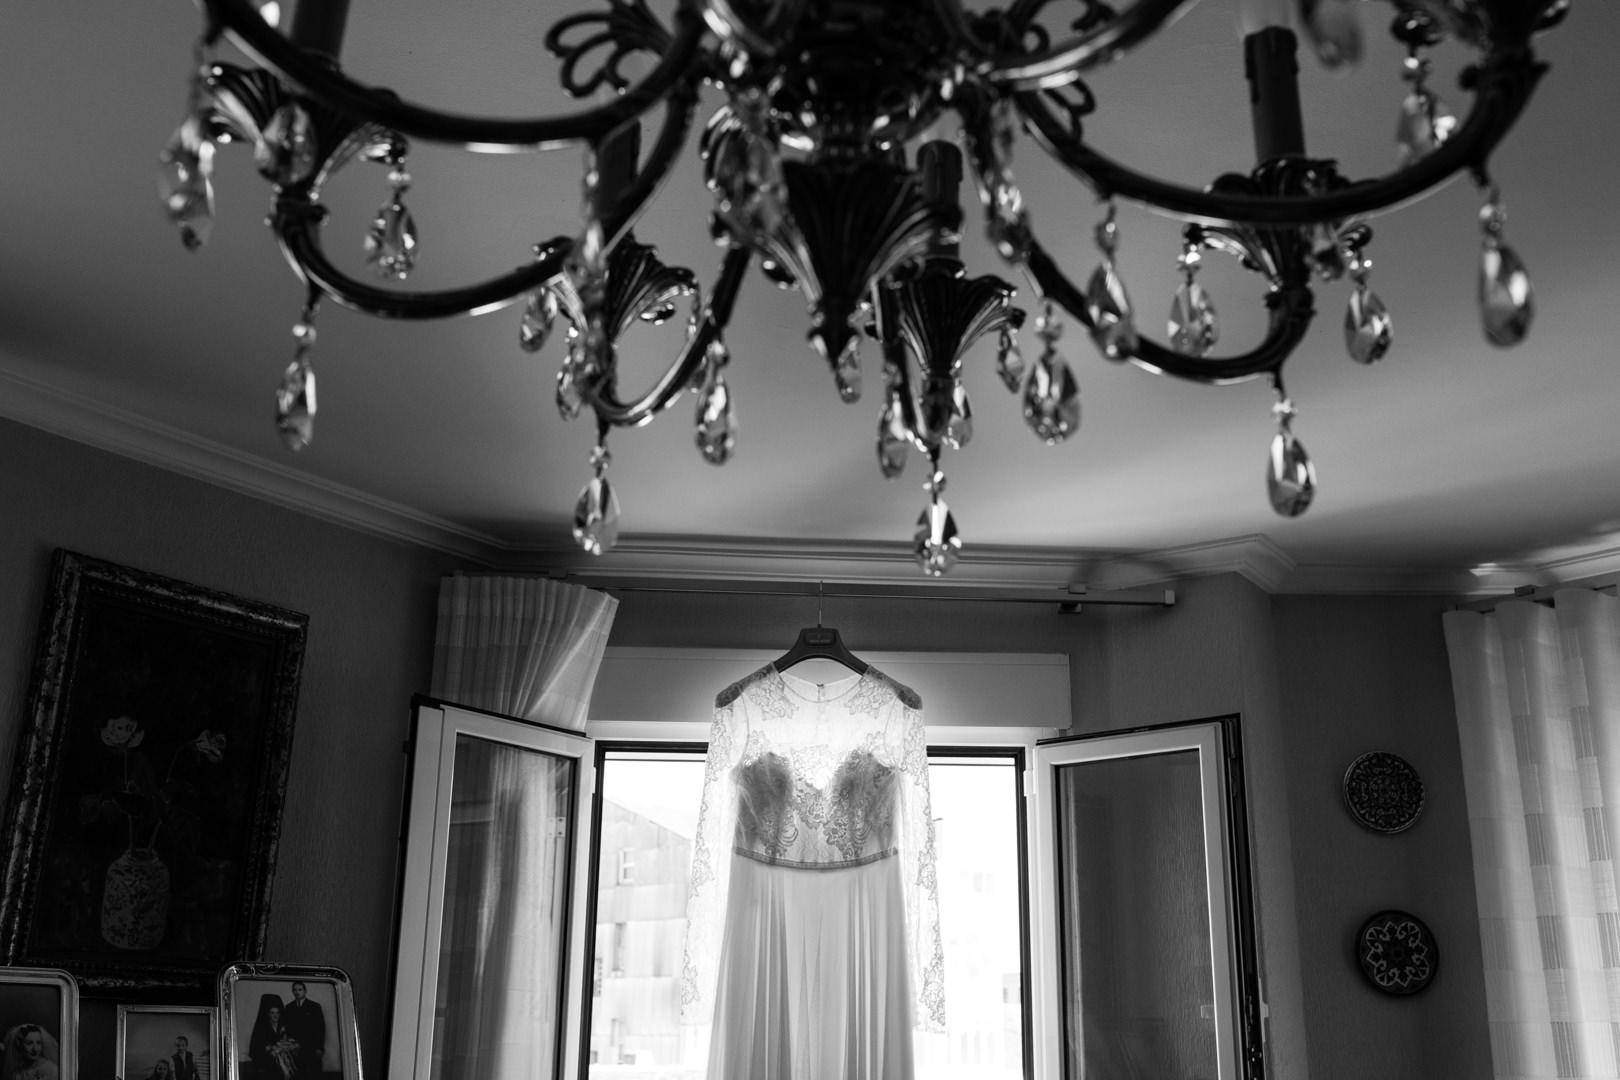 Boda-Lucia-Javi-Lugo-Rafael-Torres-fotografo-bodas-sevilla-madrid-barcelona-wedding-photographer--8.jpg